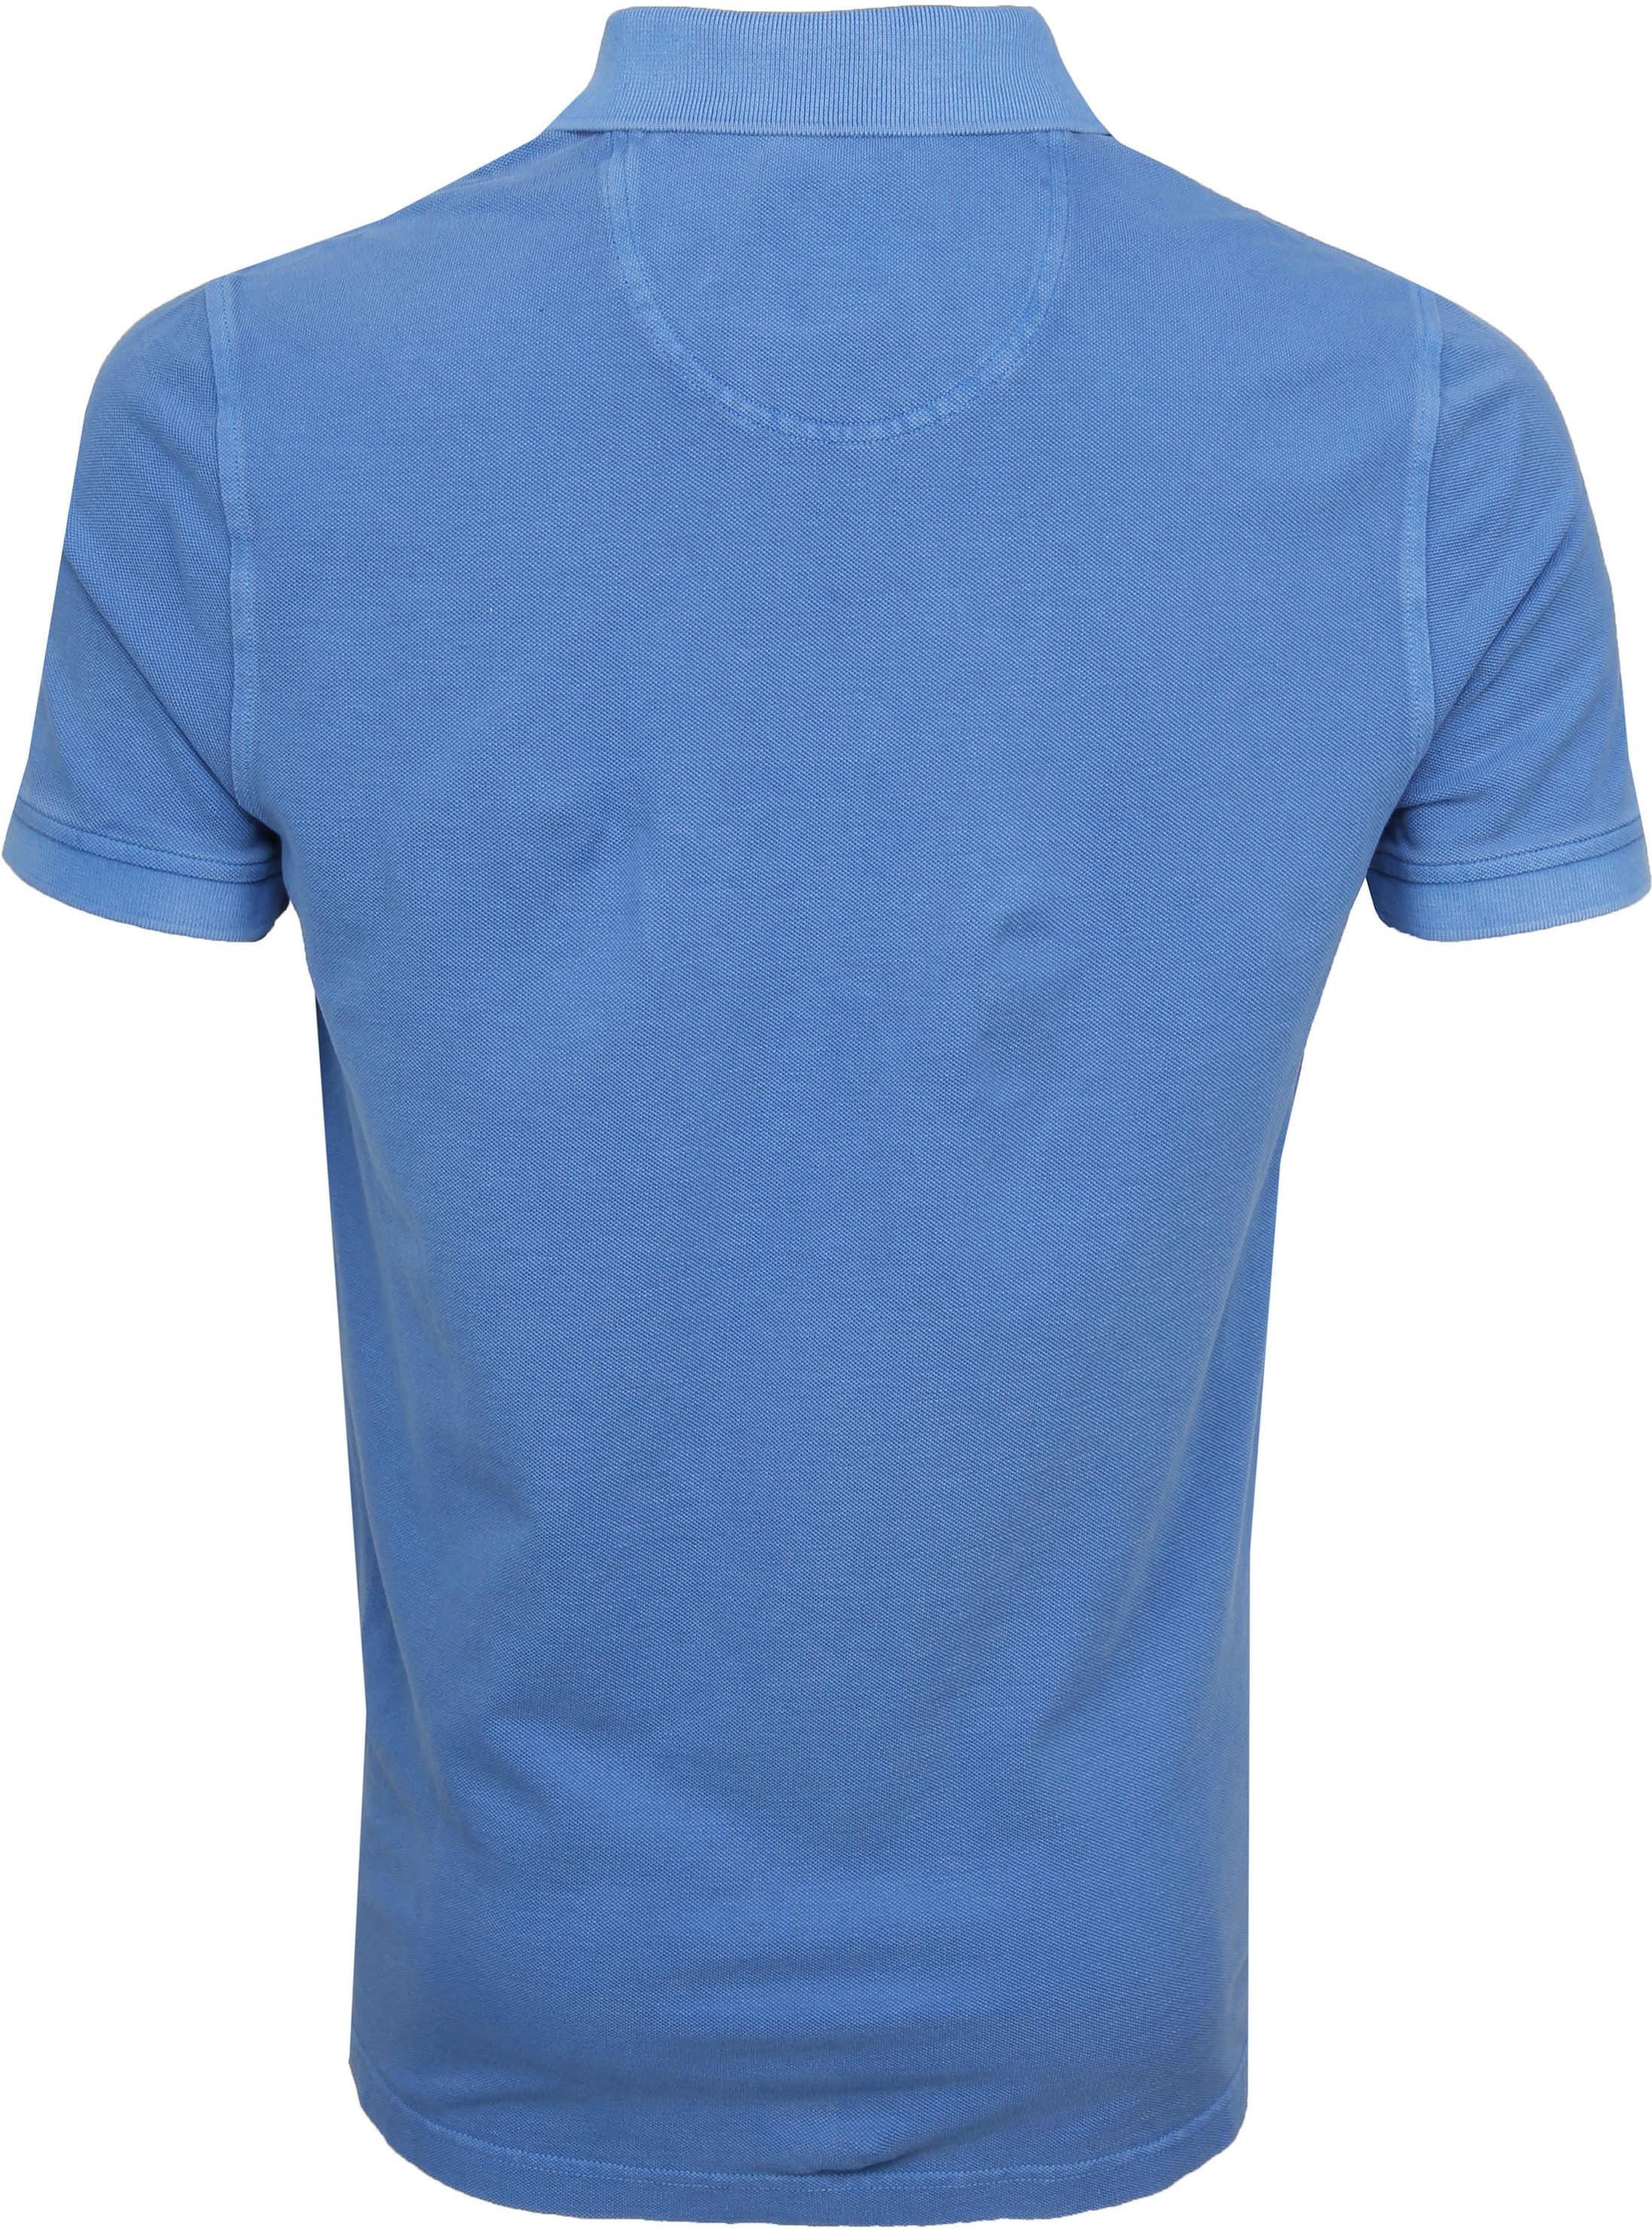 Suitable Stone Wash Poloshirt Blue foto 3